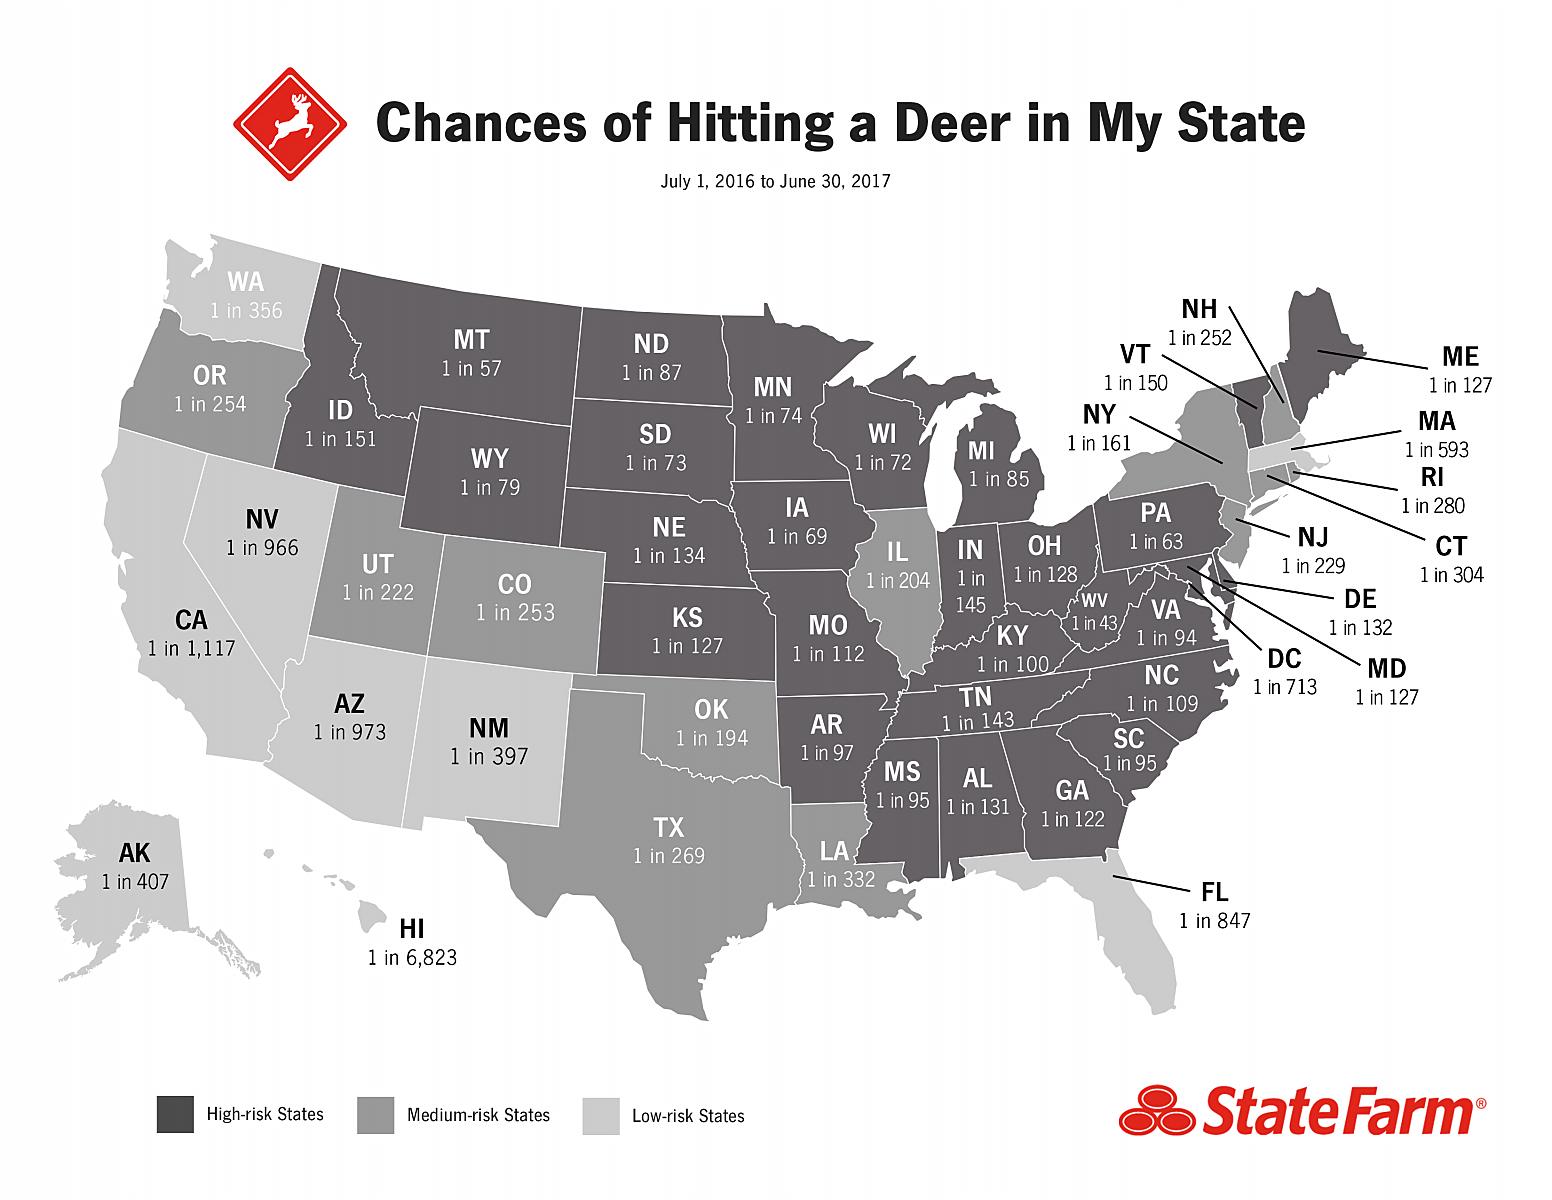 Car-Deer accident odds in US